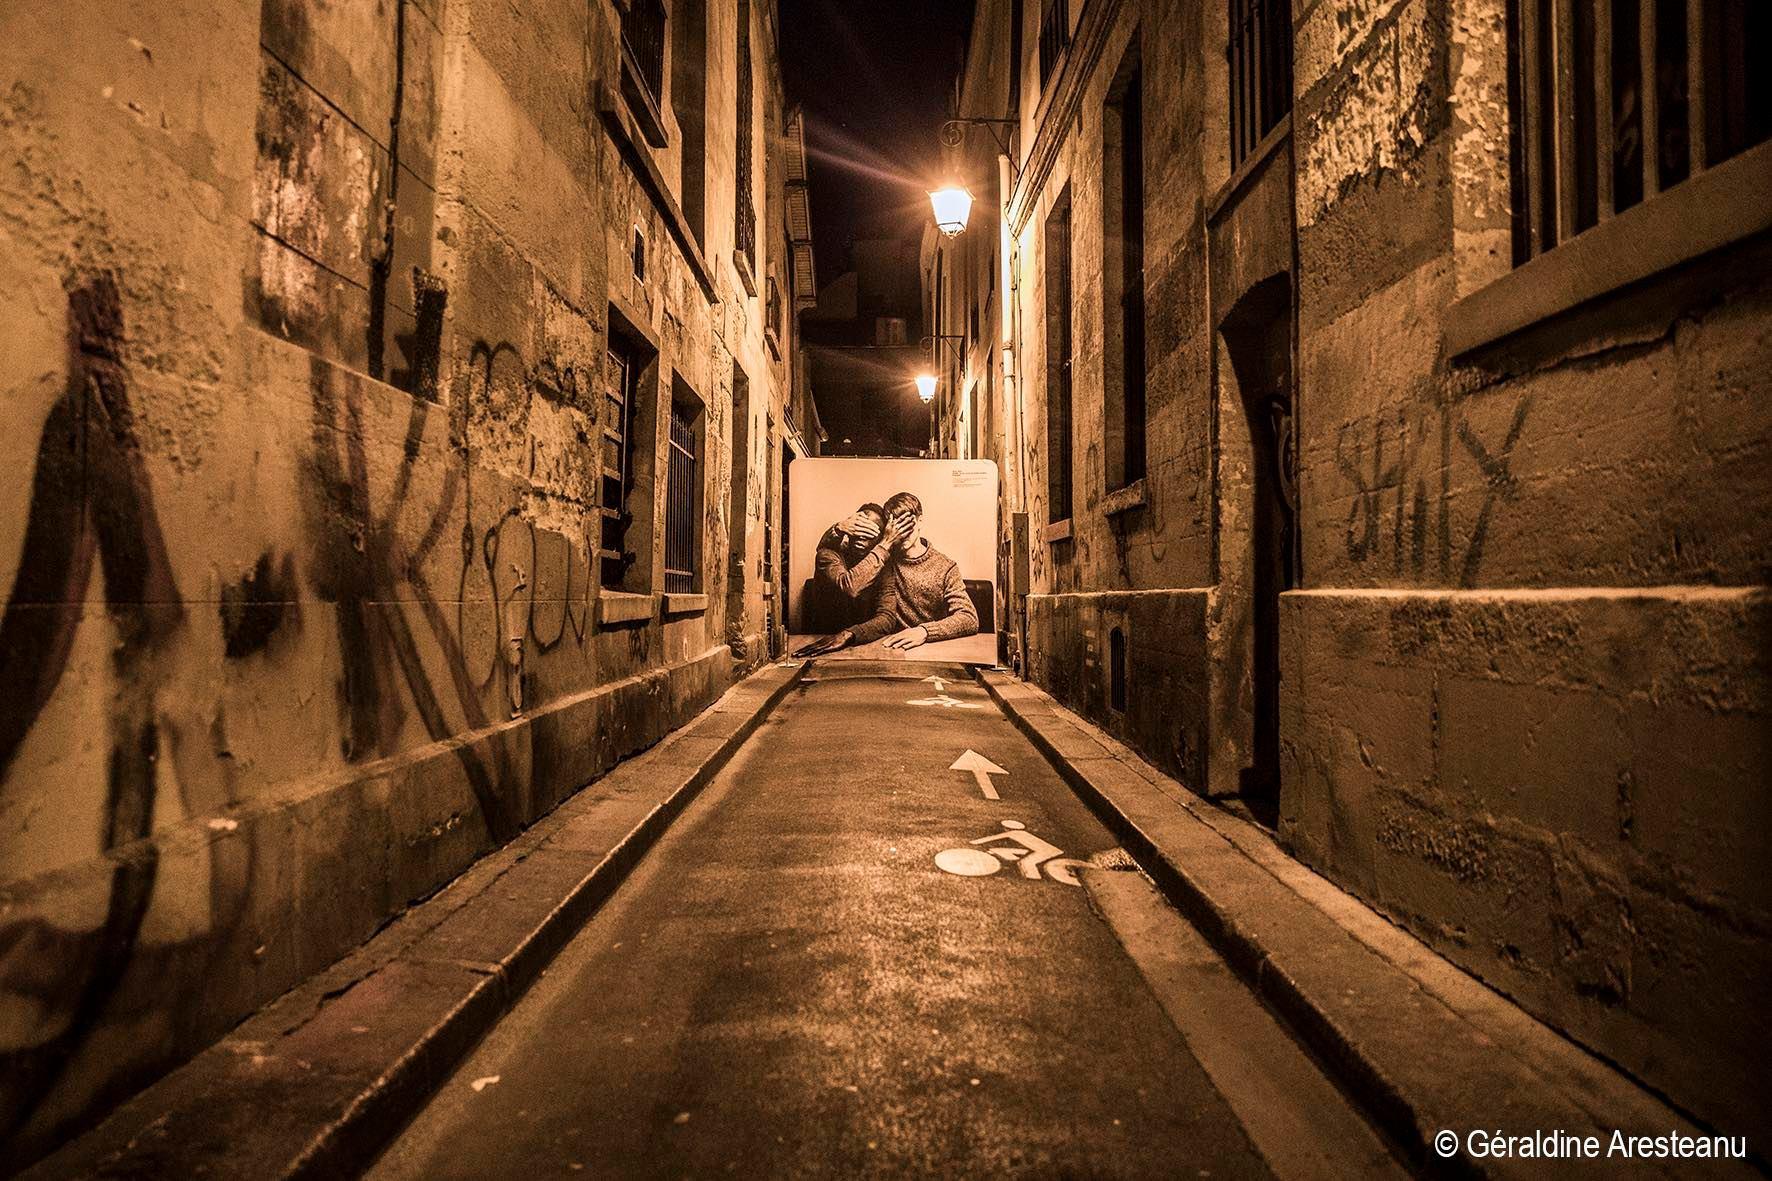 Street photo geraldine Aresteanu Paris Stop kidding